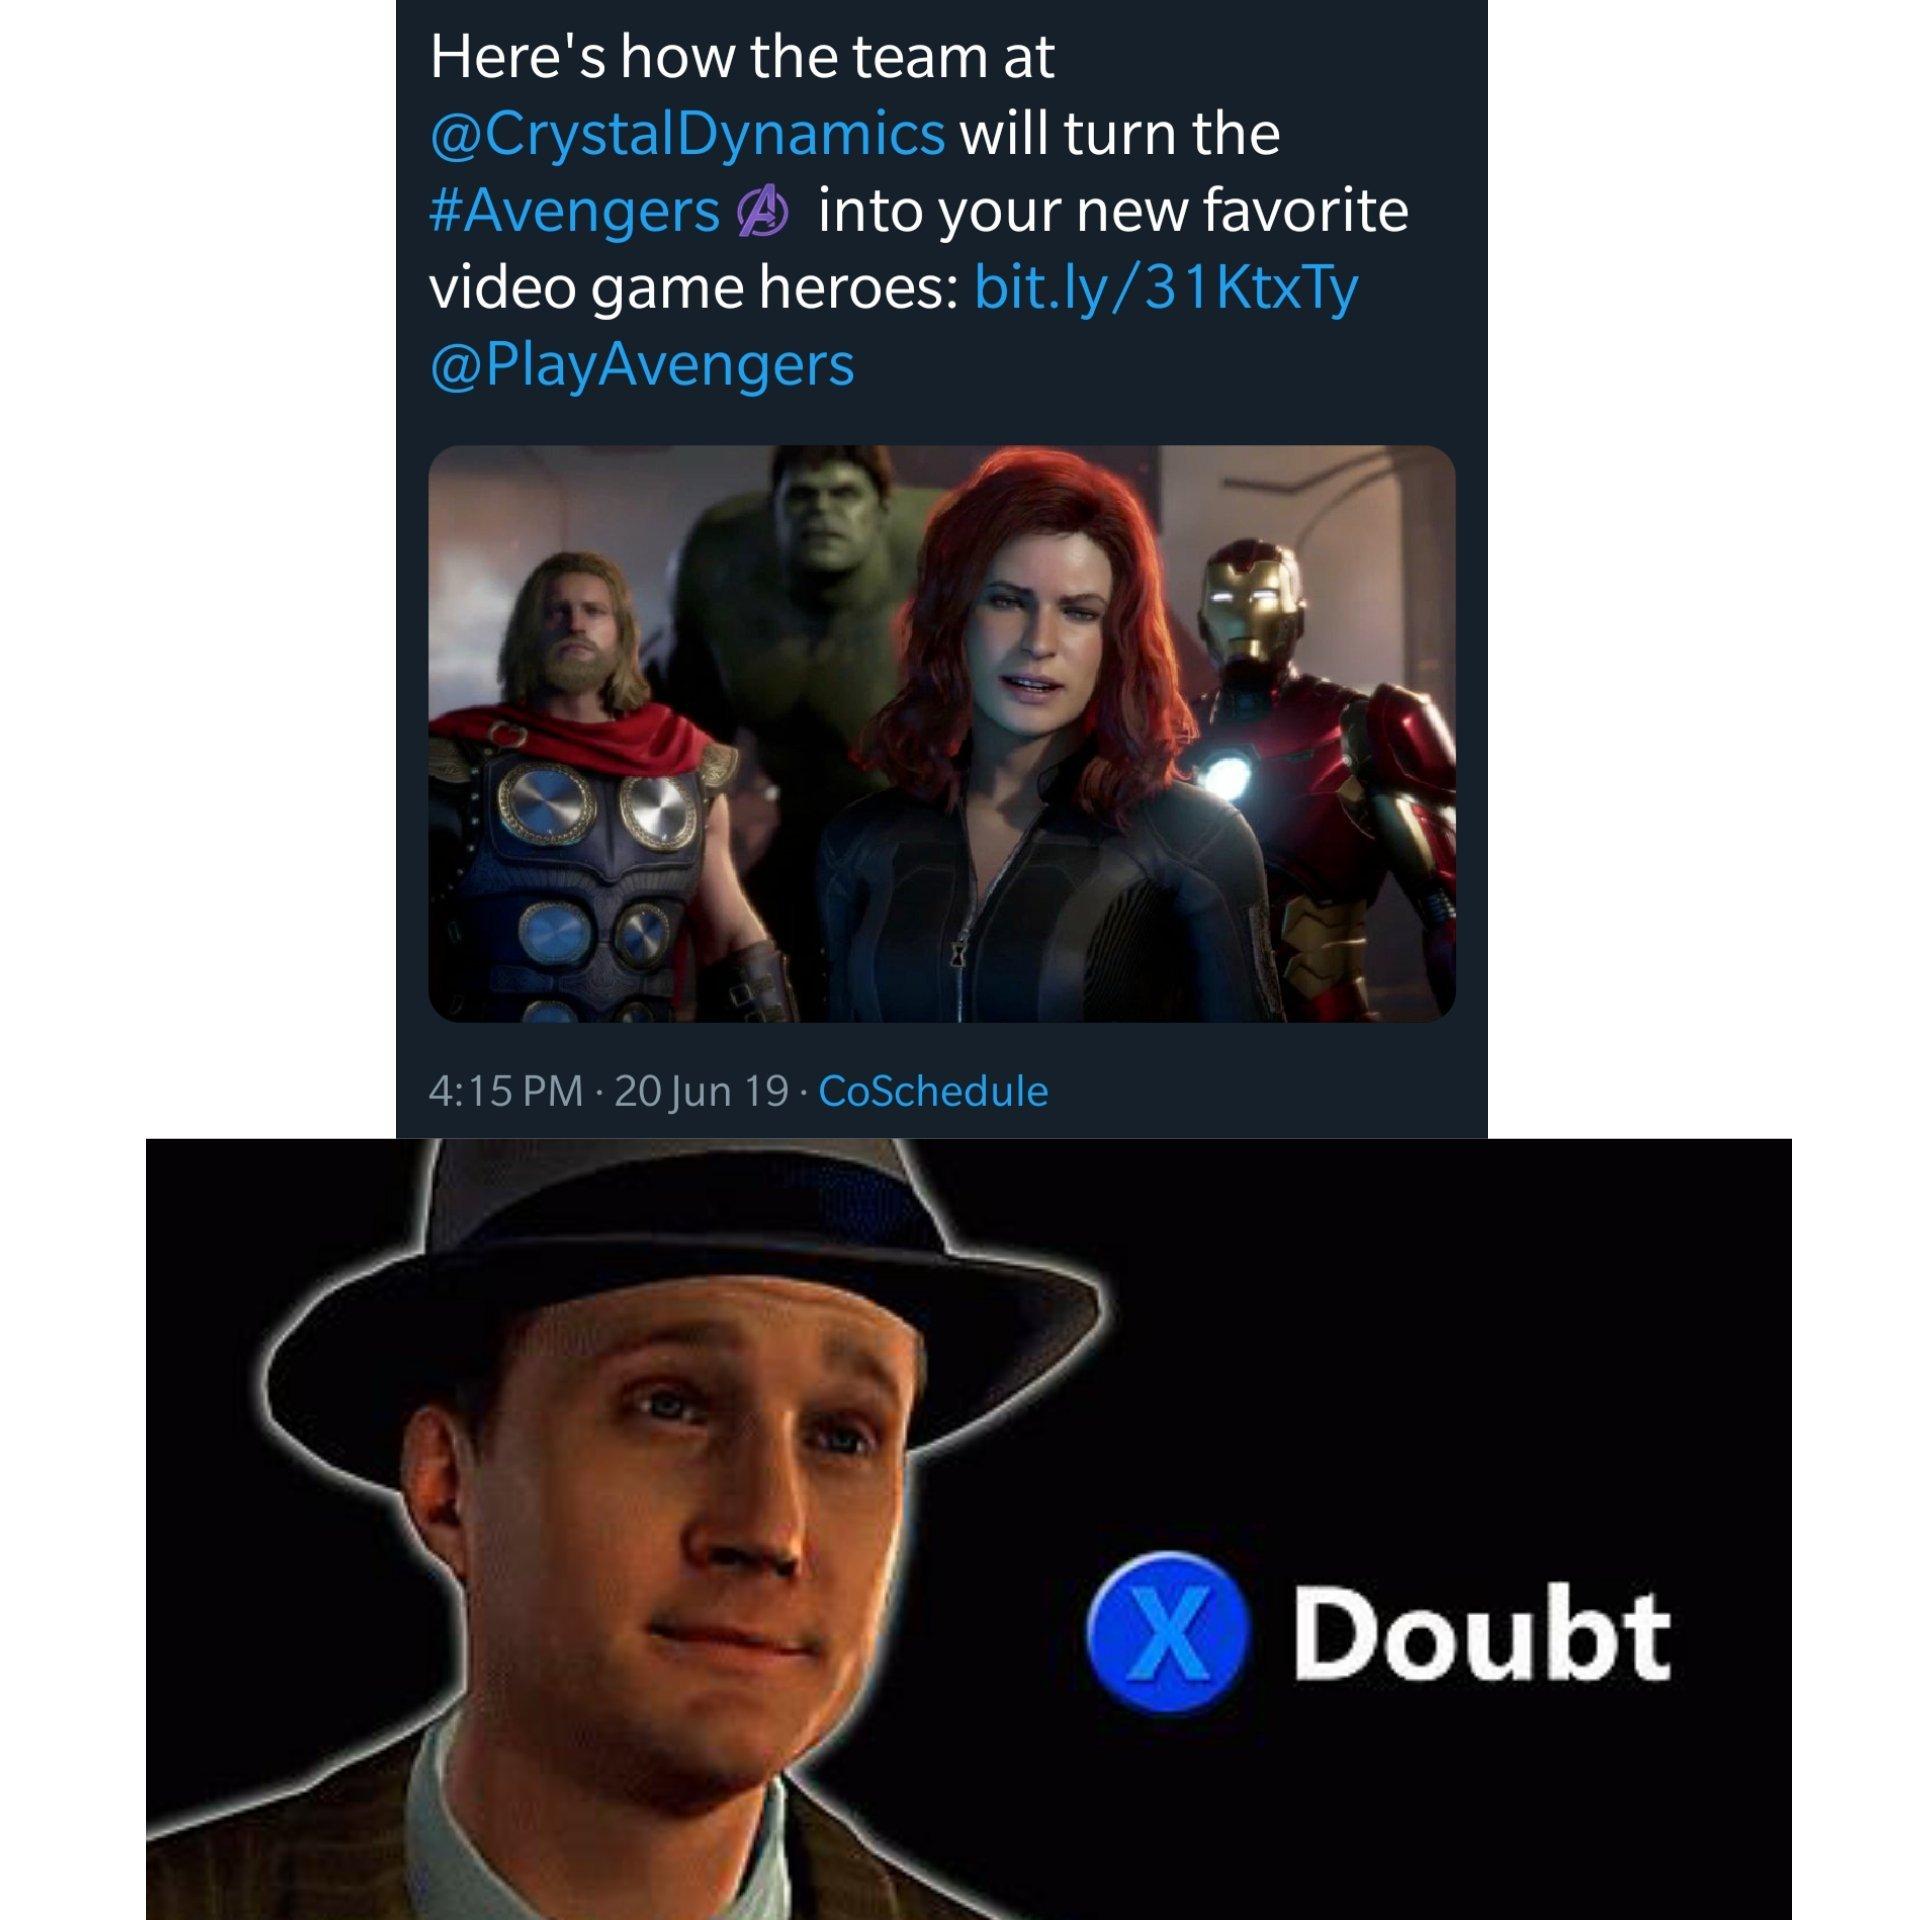 I doubt ye mate - meme